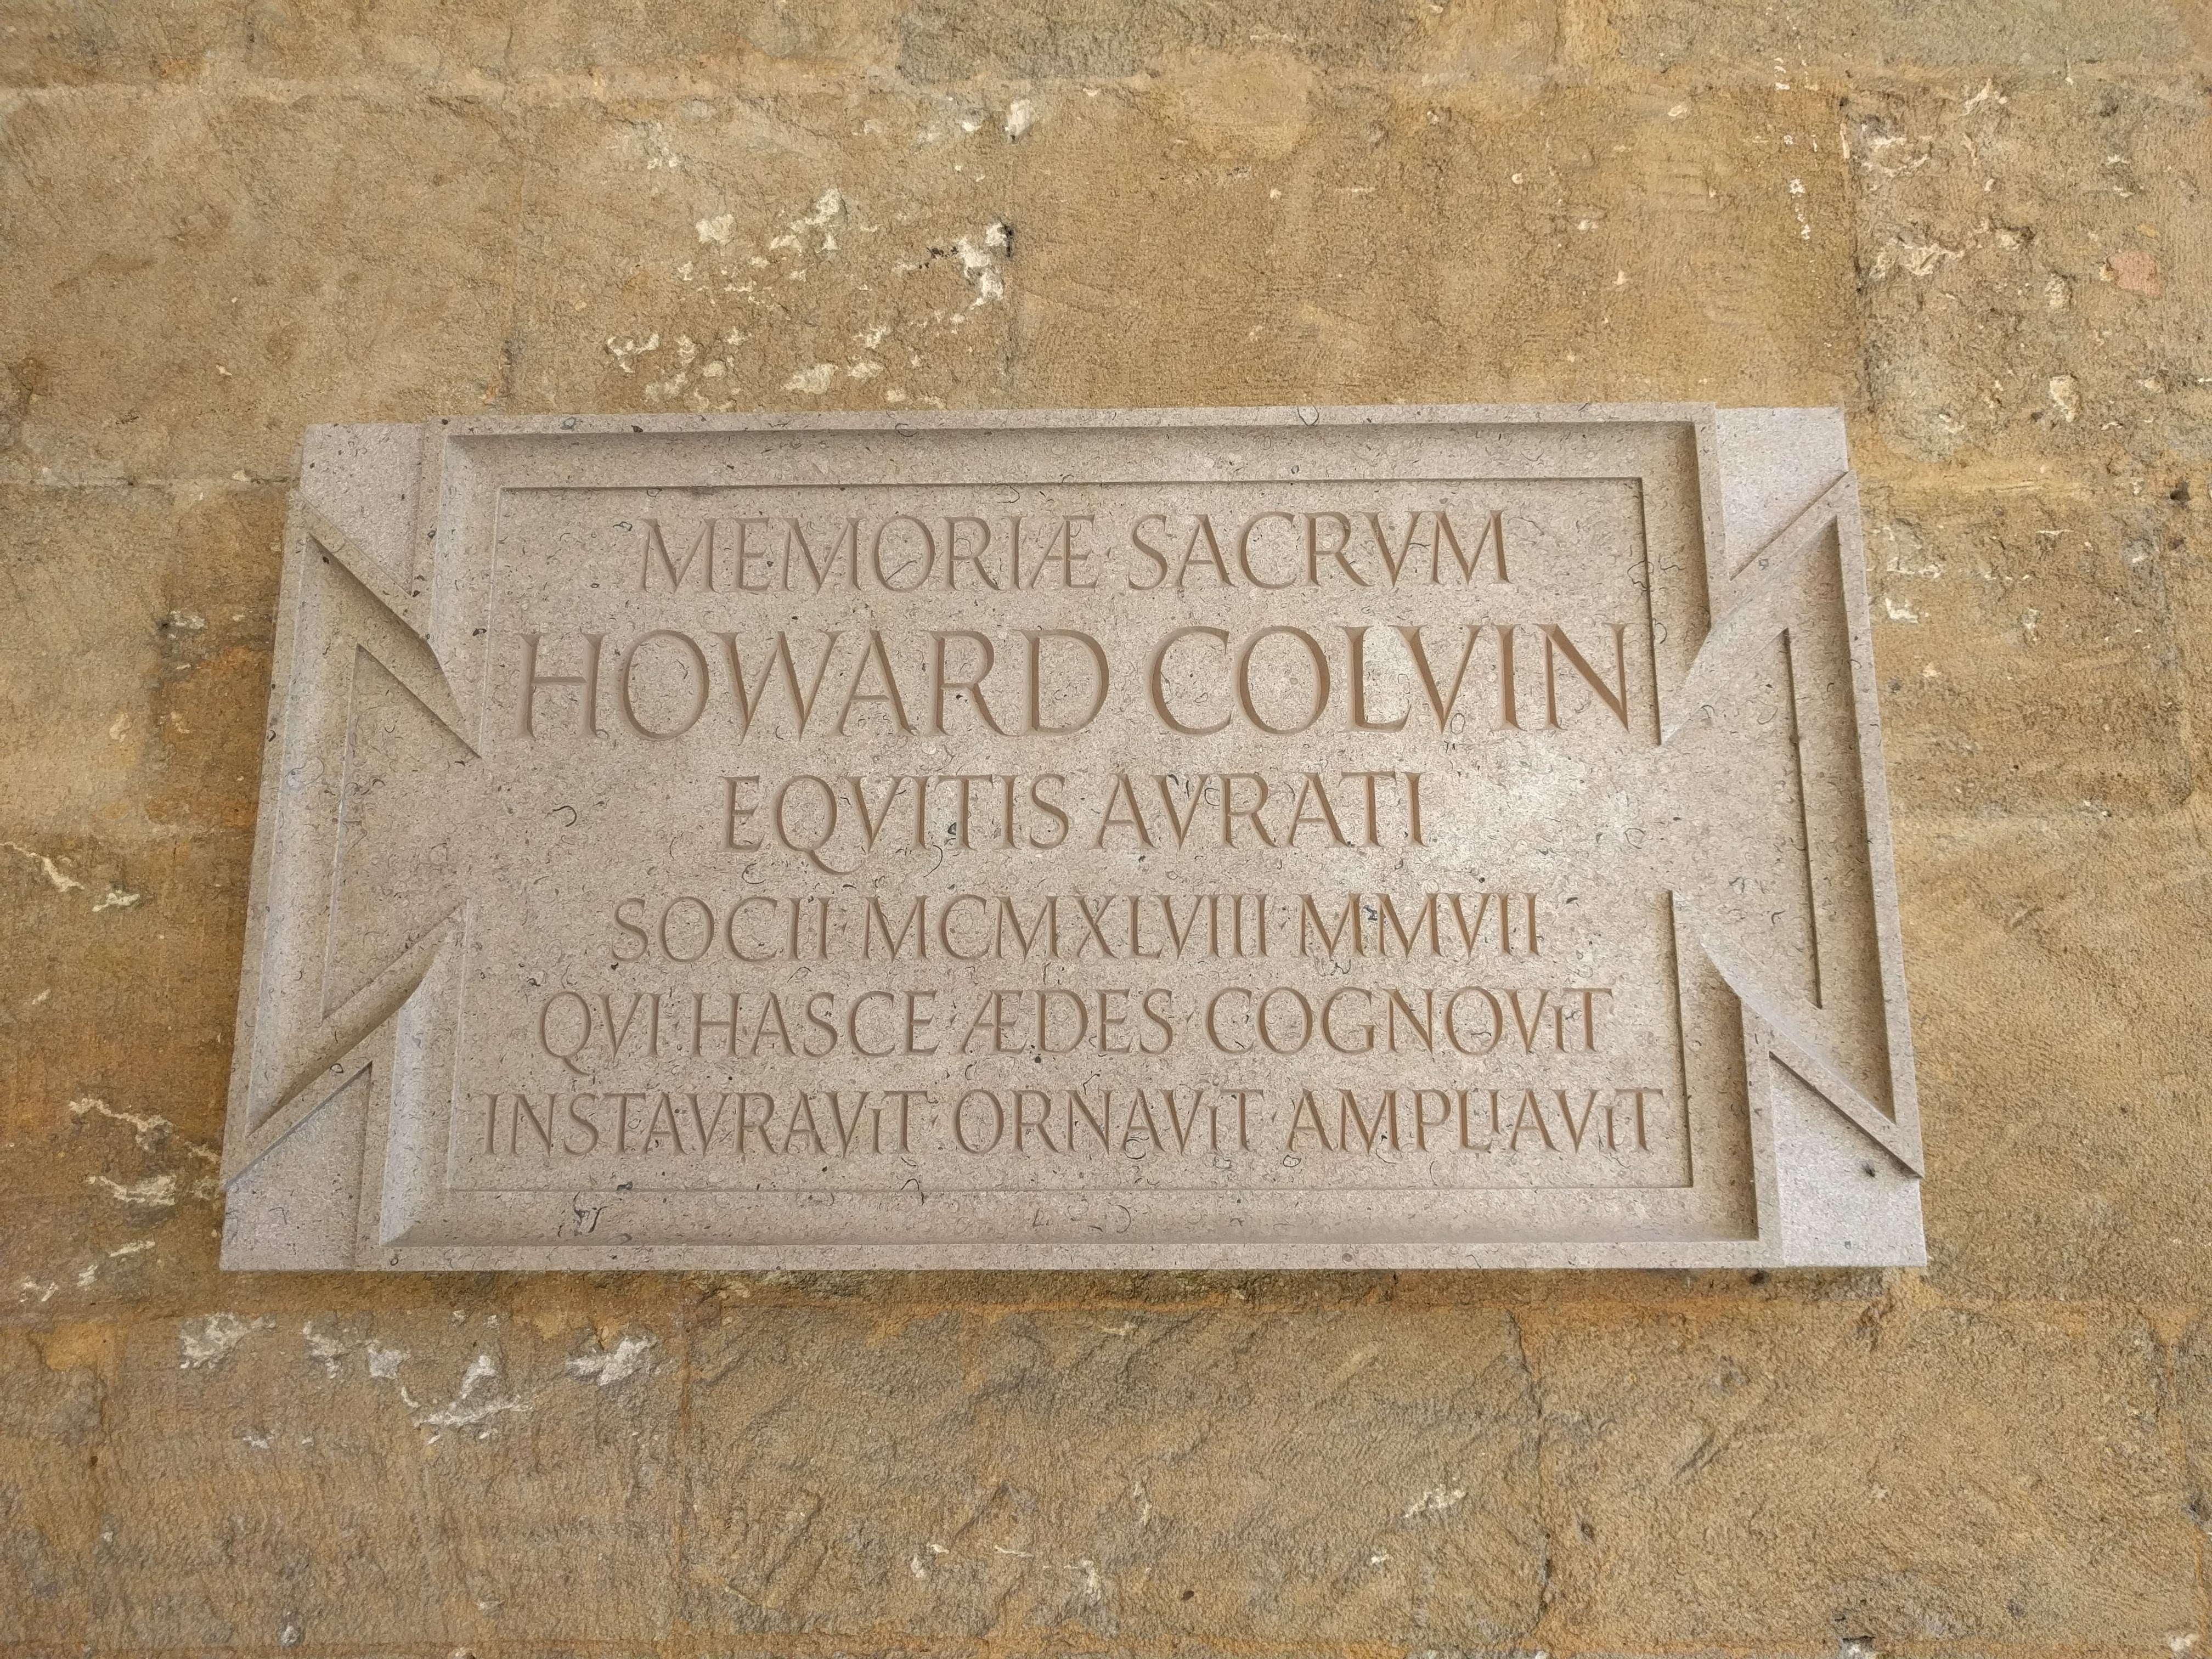 Memorial plaque, St John's College Oxford